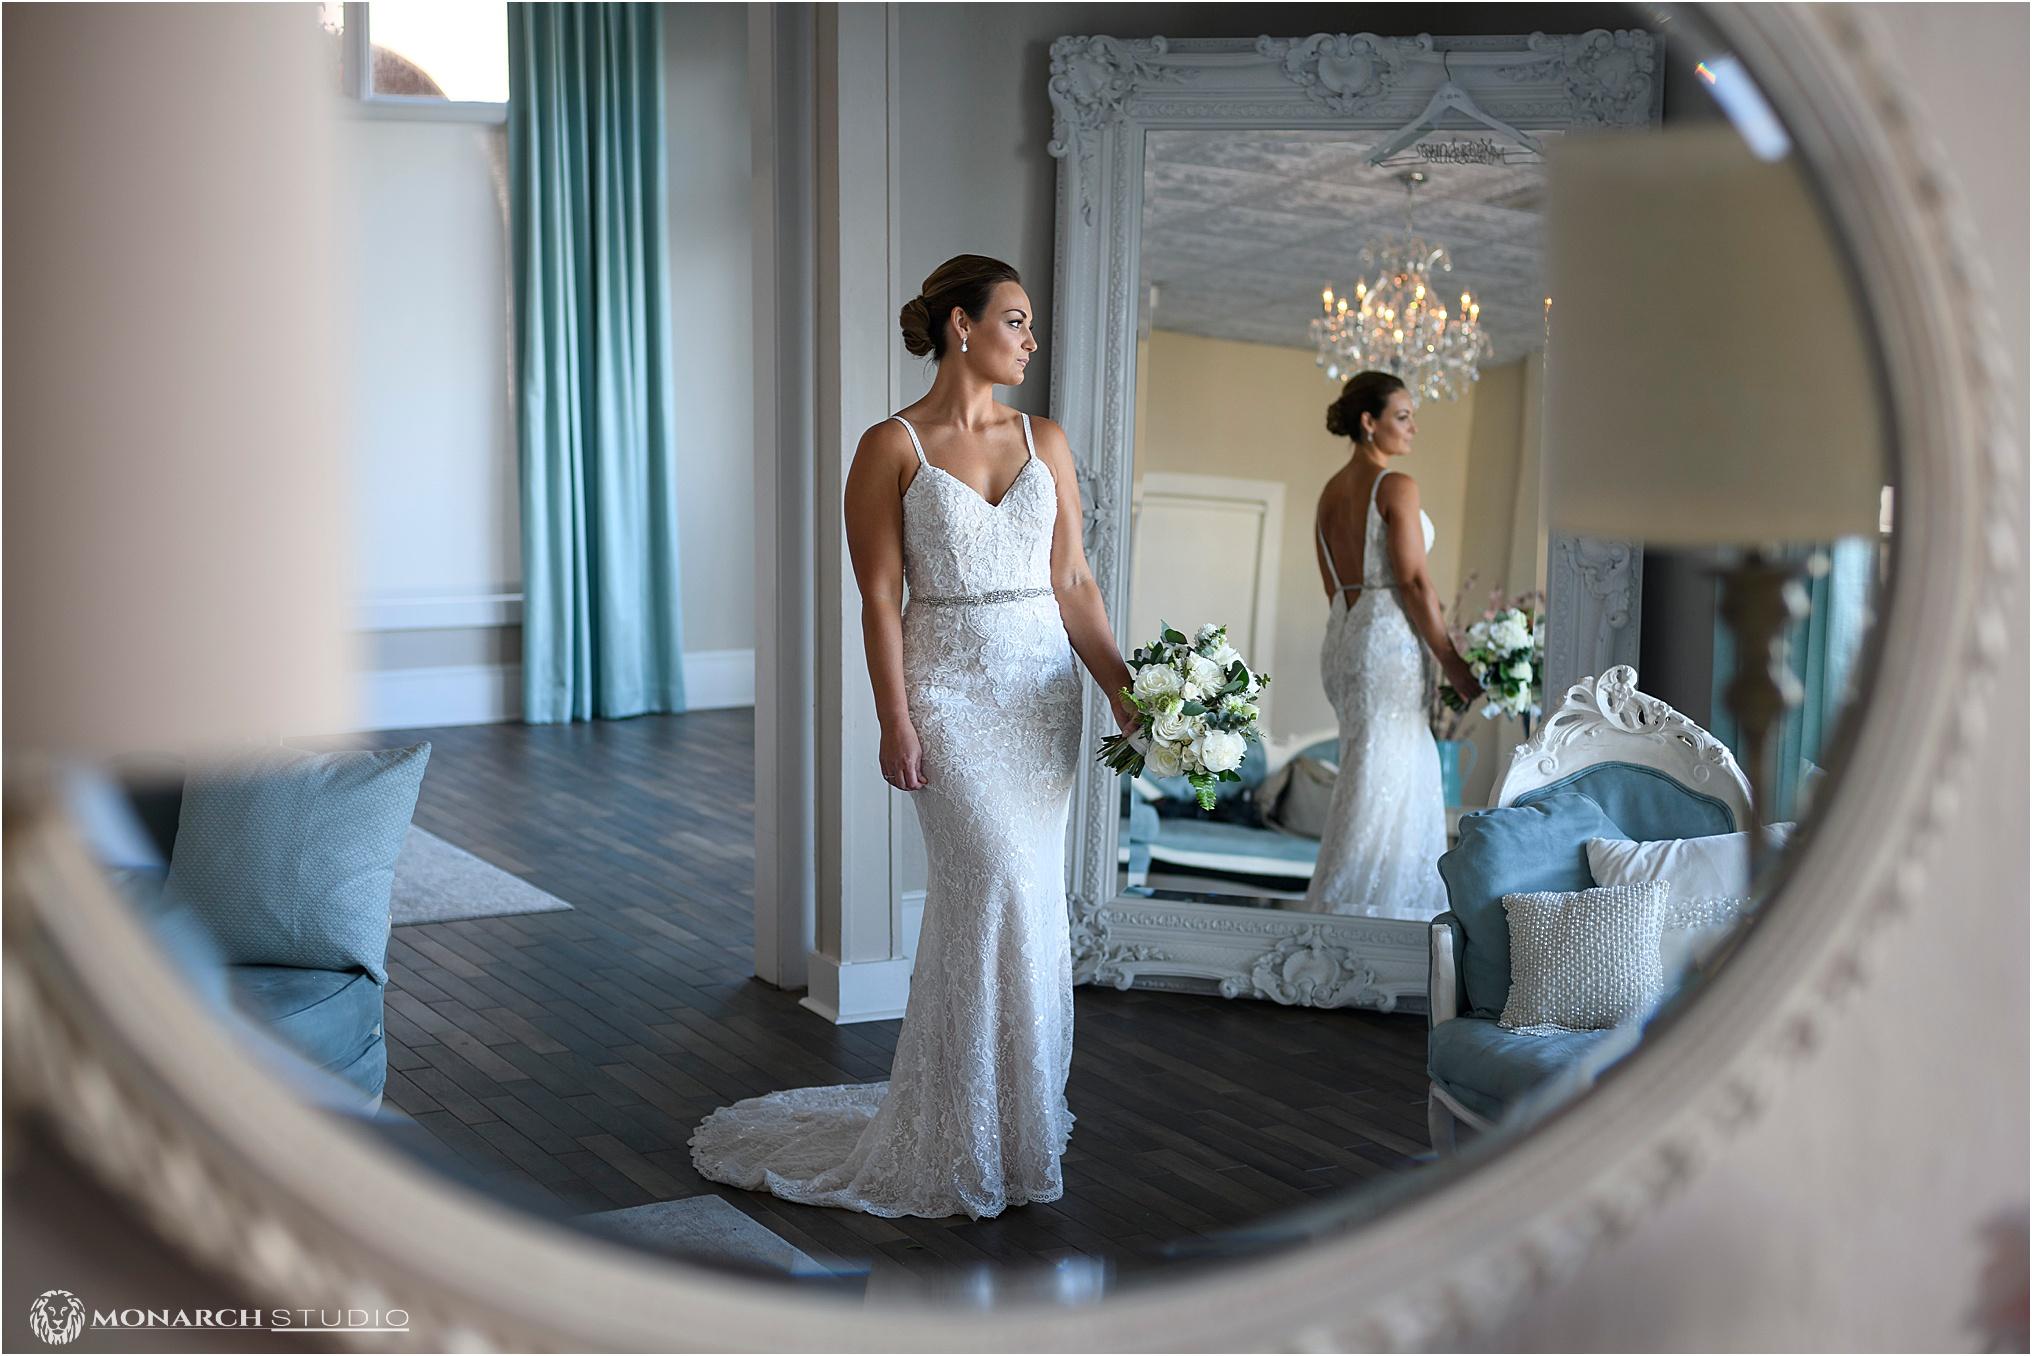 035-whiteroom-wedding-photographer-2019-05-22_0017.jpg